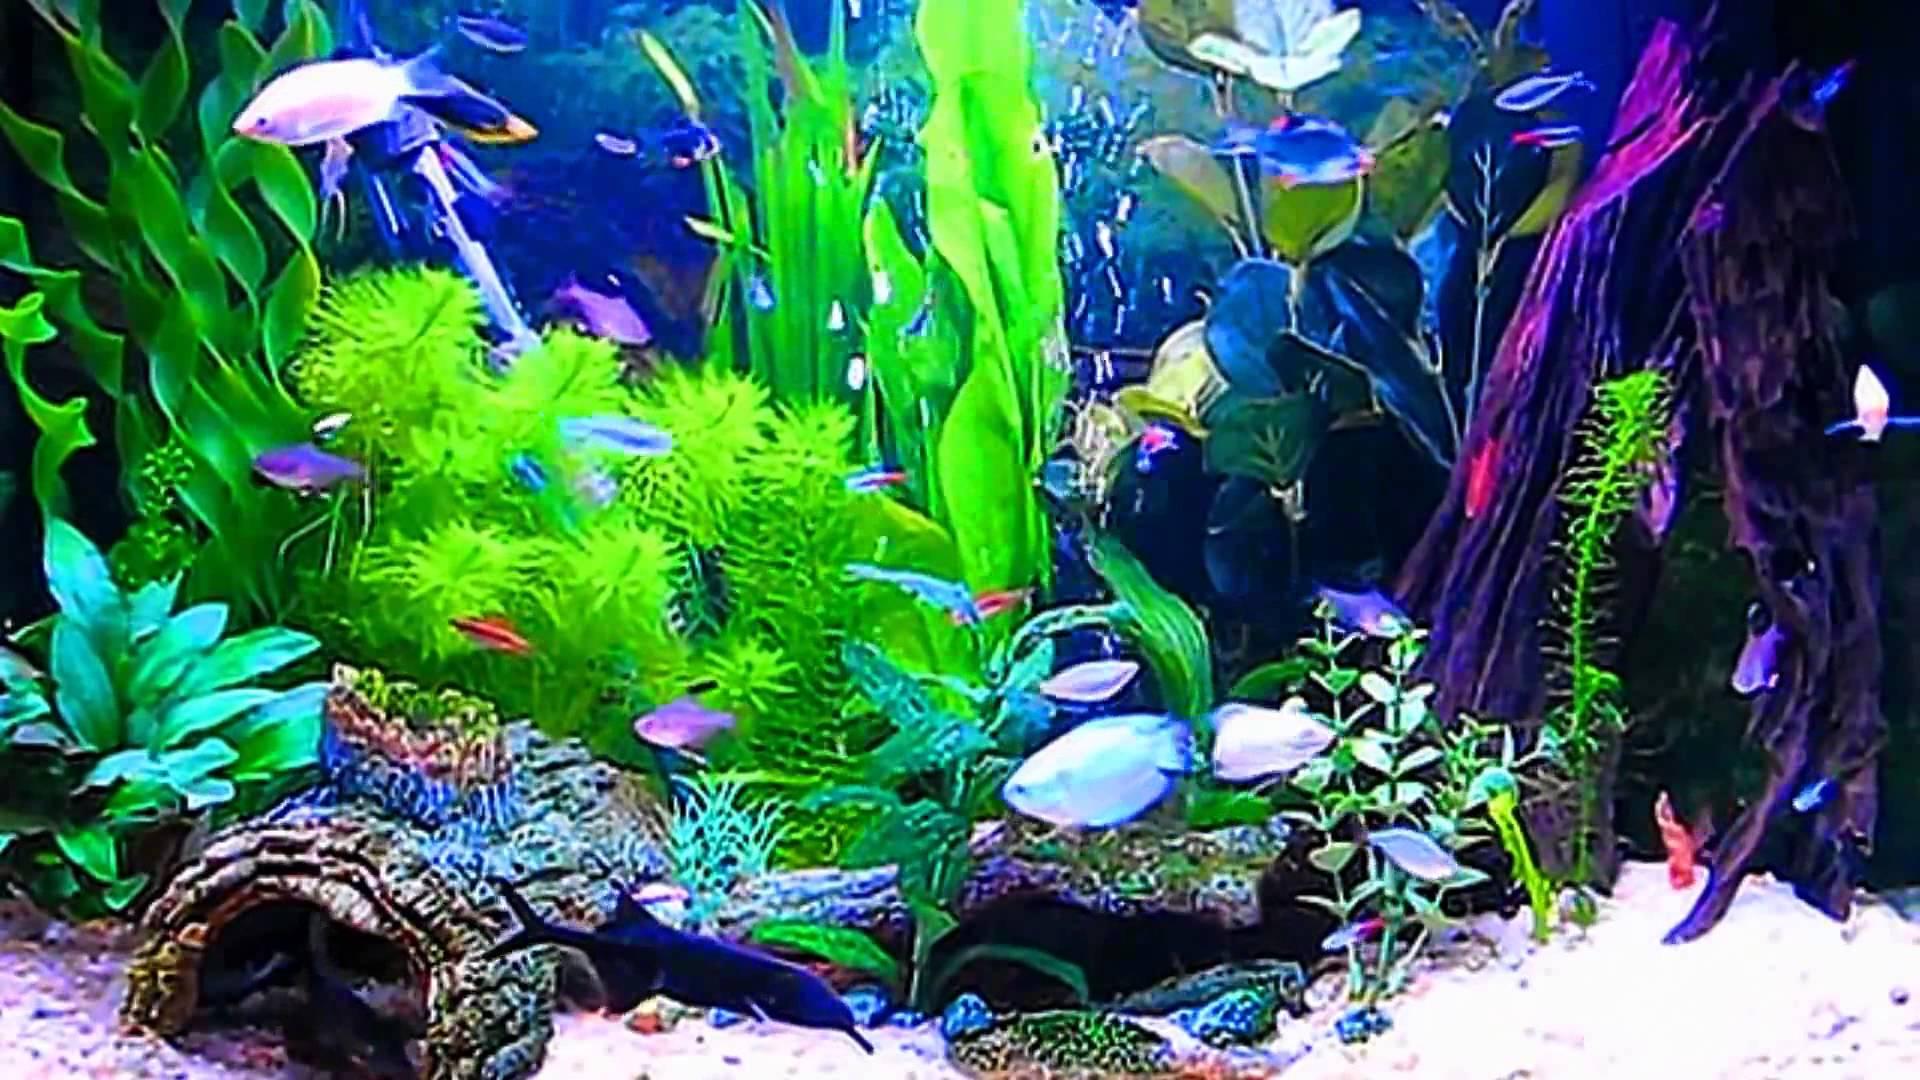 Fish aquarium screensaver for xp - Amazing Hd Aquarium Screensaver Free Windows And Android Full Hd